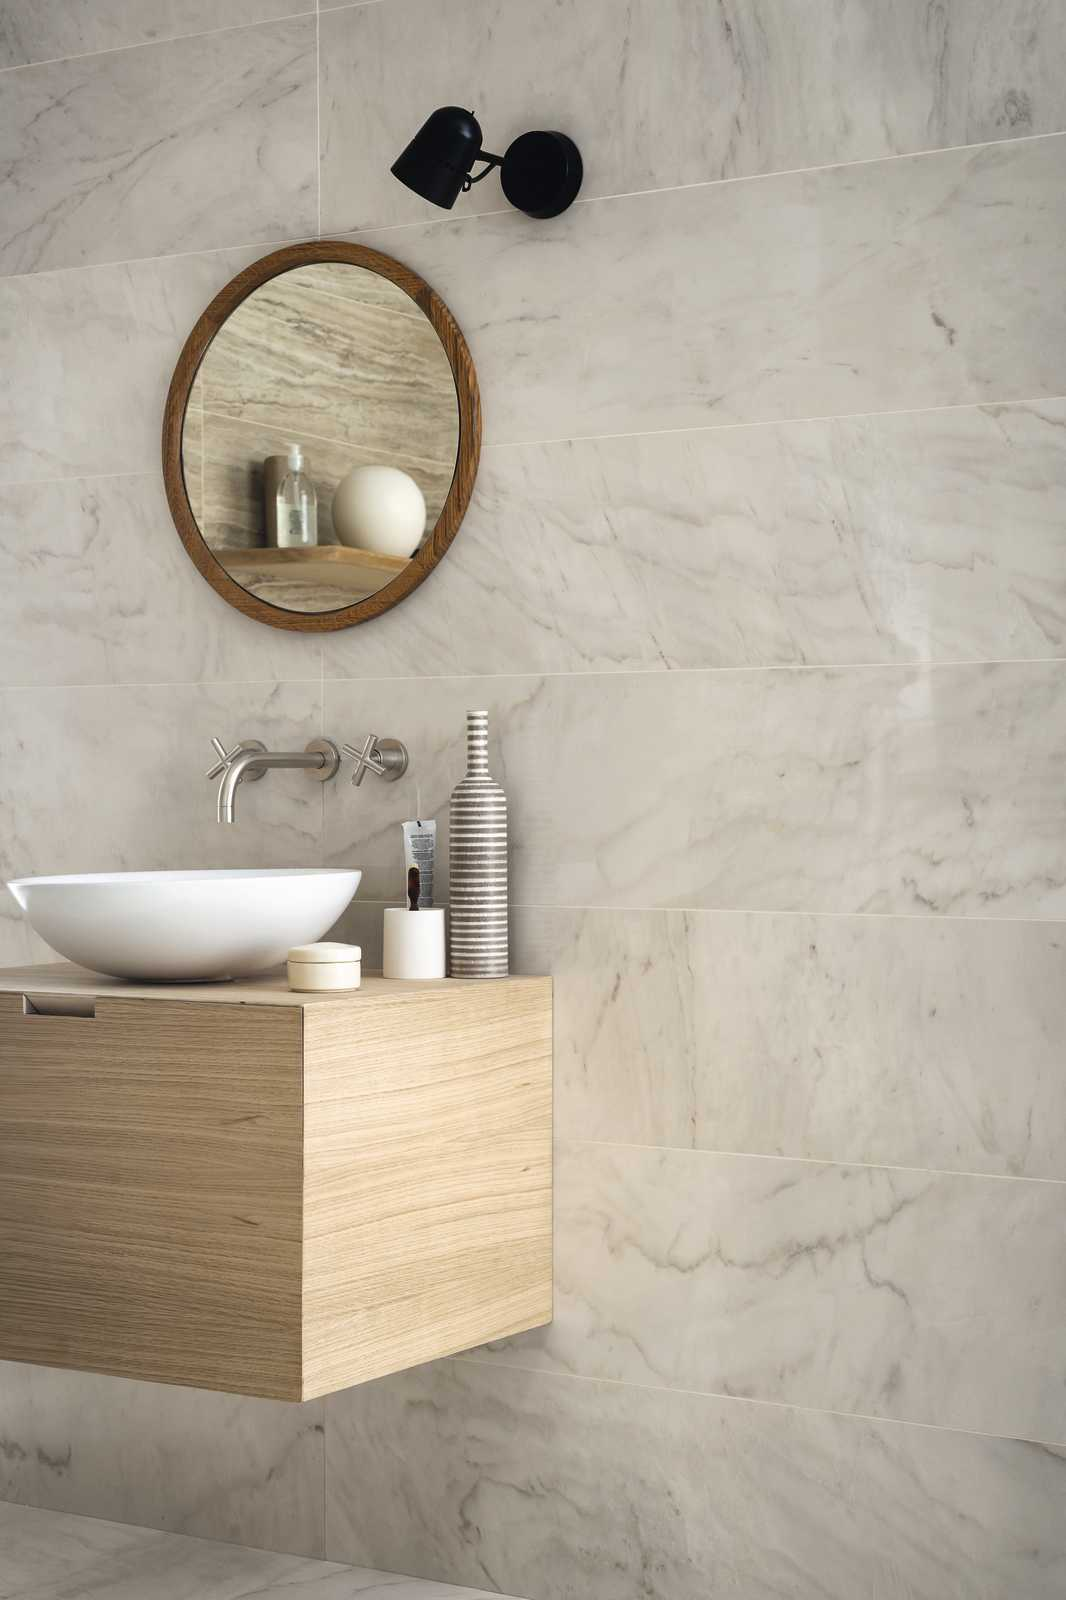 Allmarble Ceramic Tiles Marazzi_7095